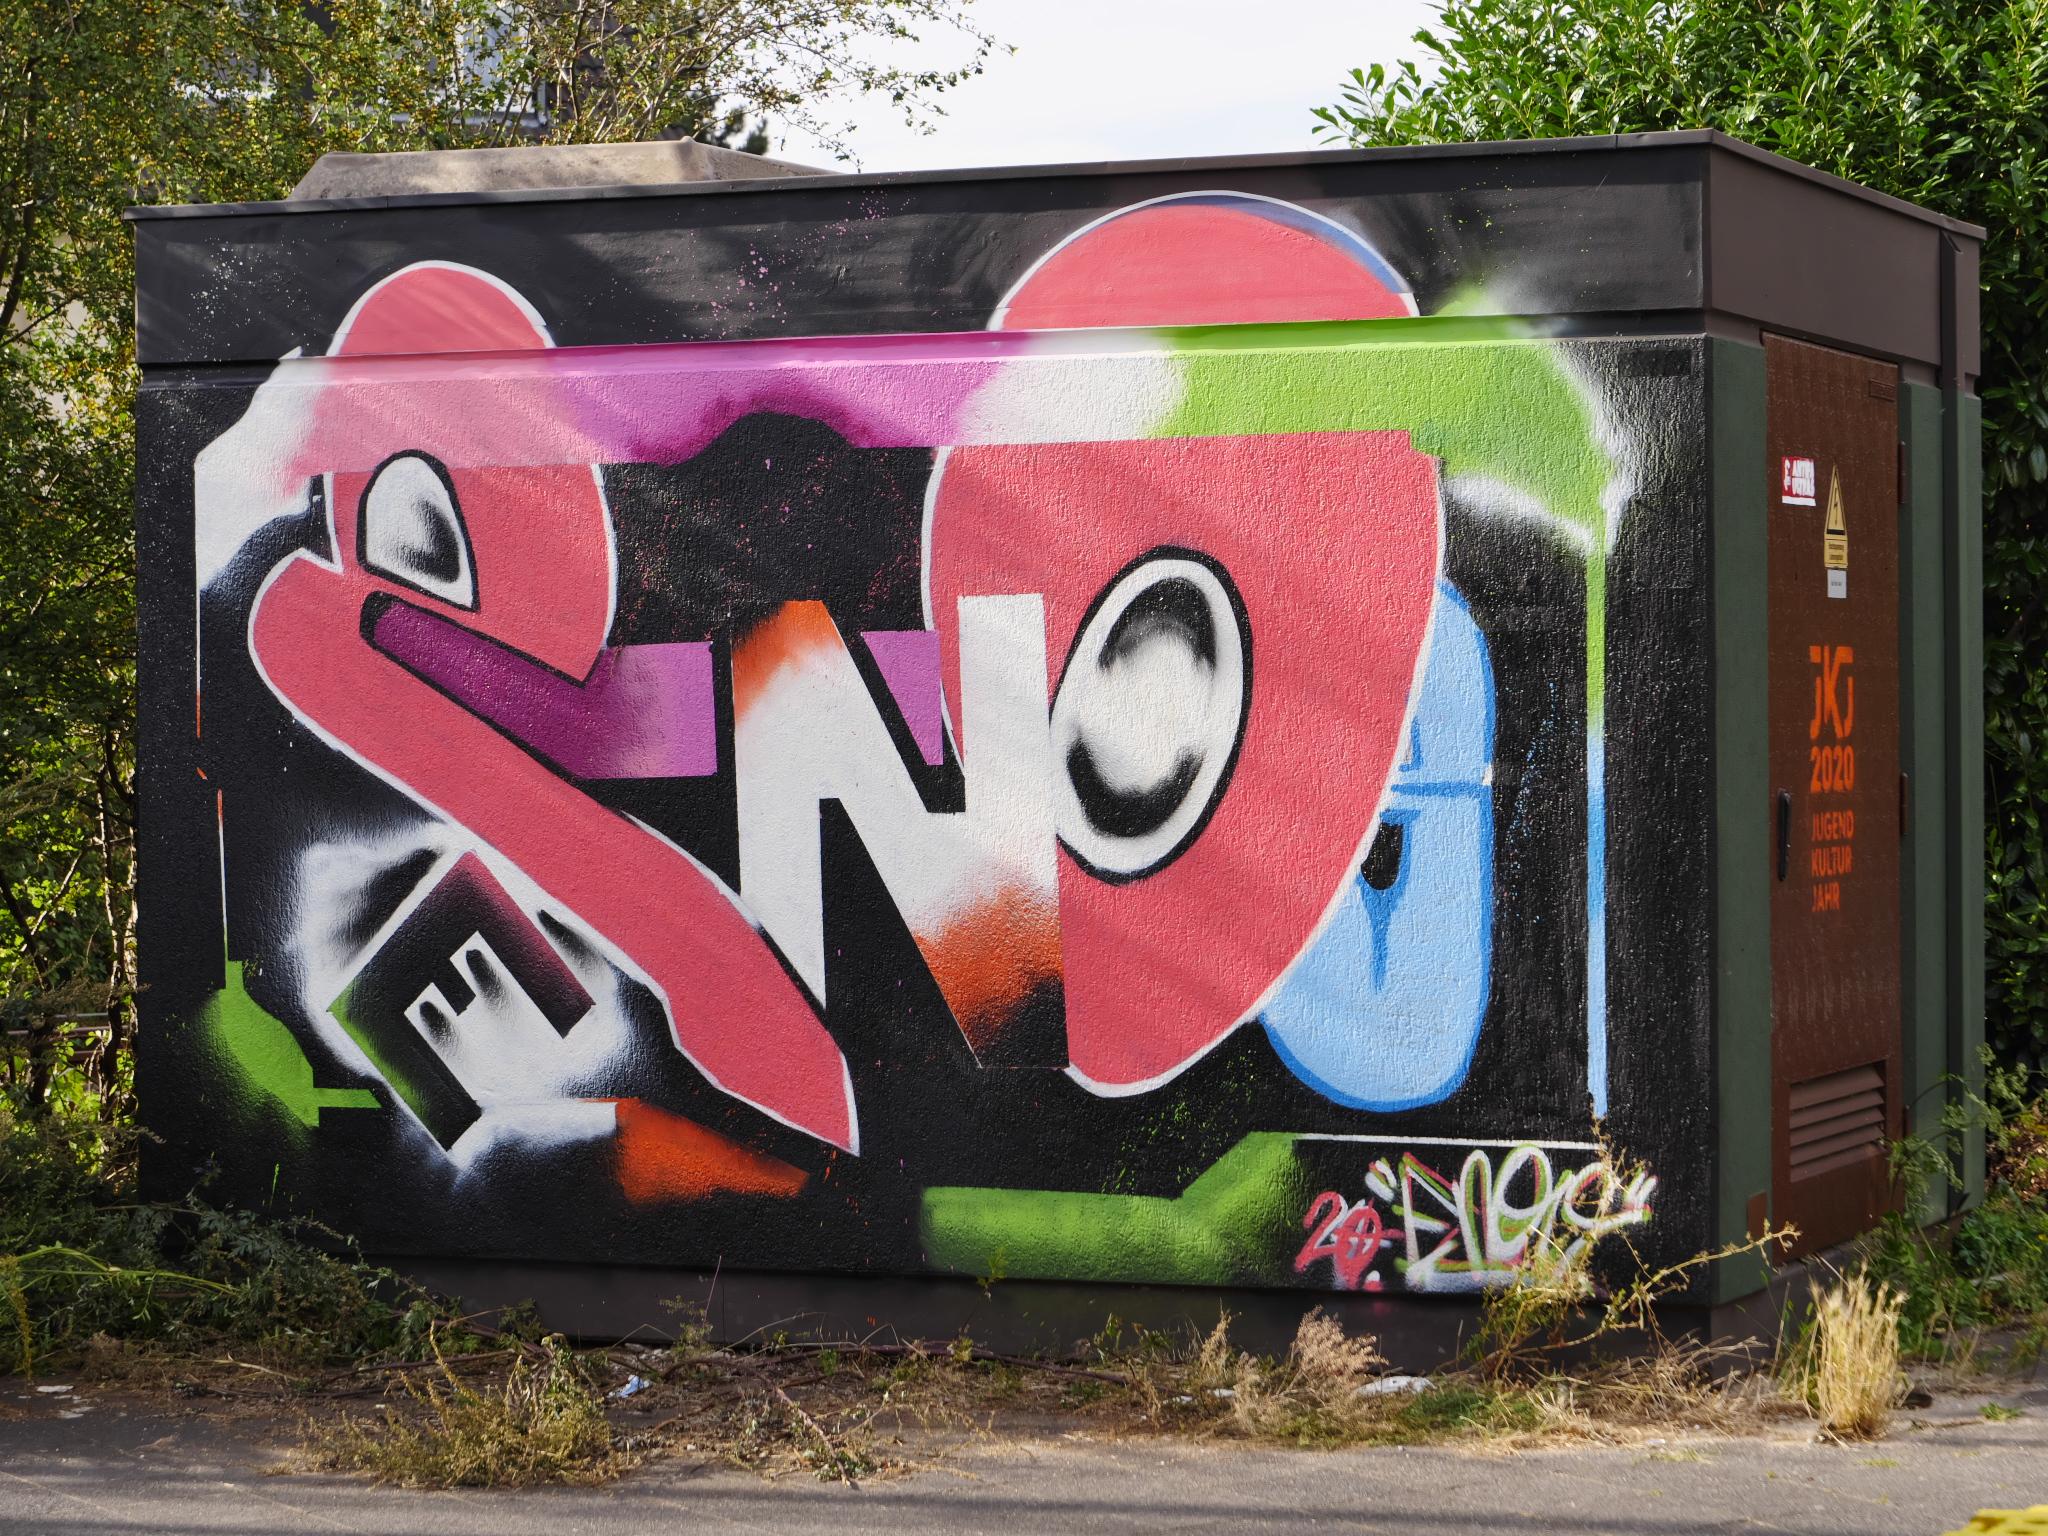 jugendkulturjahr-2020-ratingen-jkj2020-graffiti-trafohaeuschen-stadtwerke-Bild02